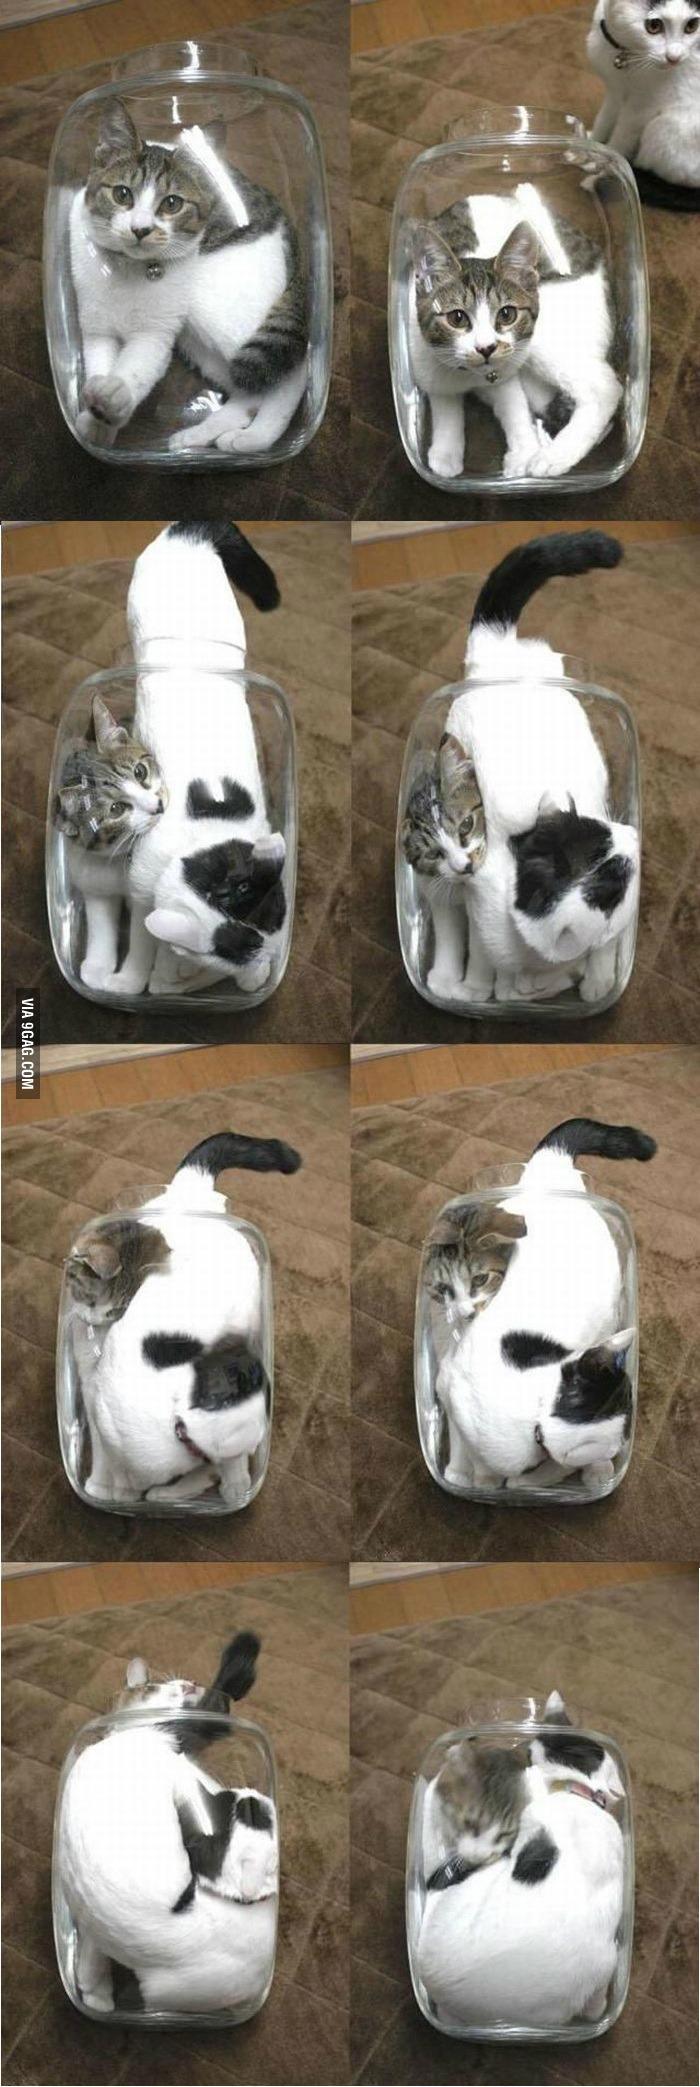 Cats In Jars And Bonsai Kittens Blog By Fray32 Ign Bonsai Kitten Kittens Glass Jars